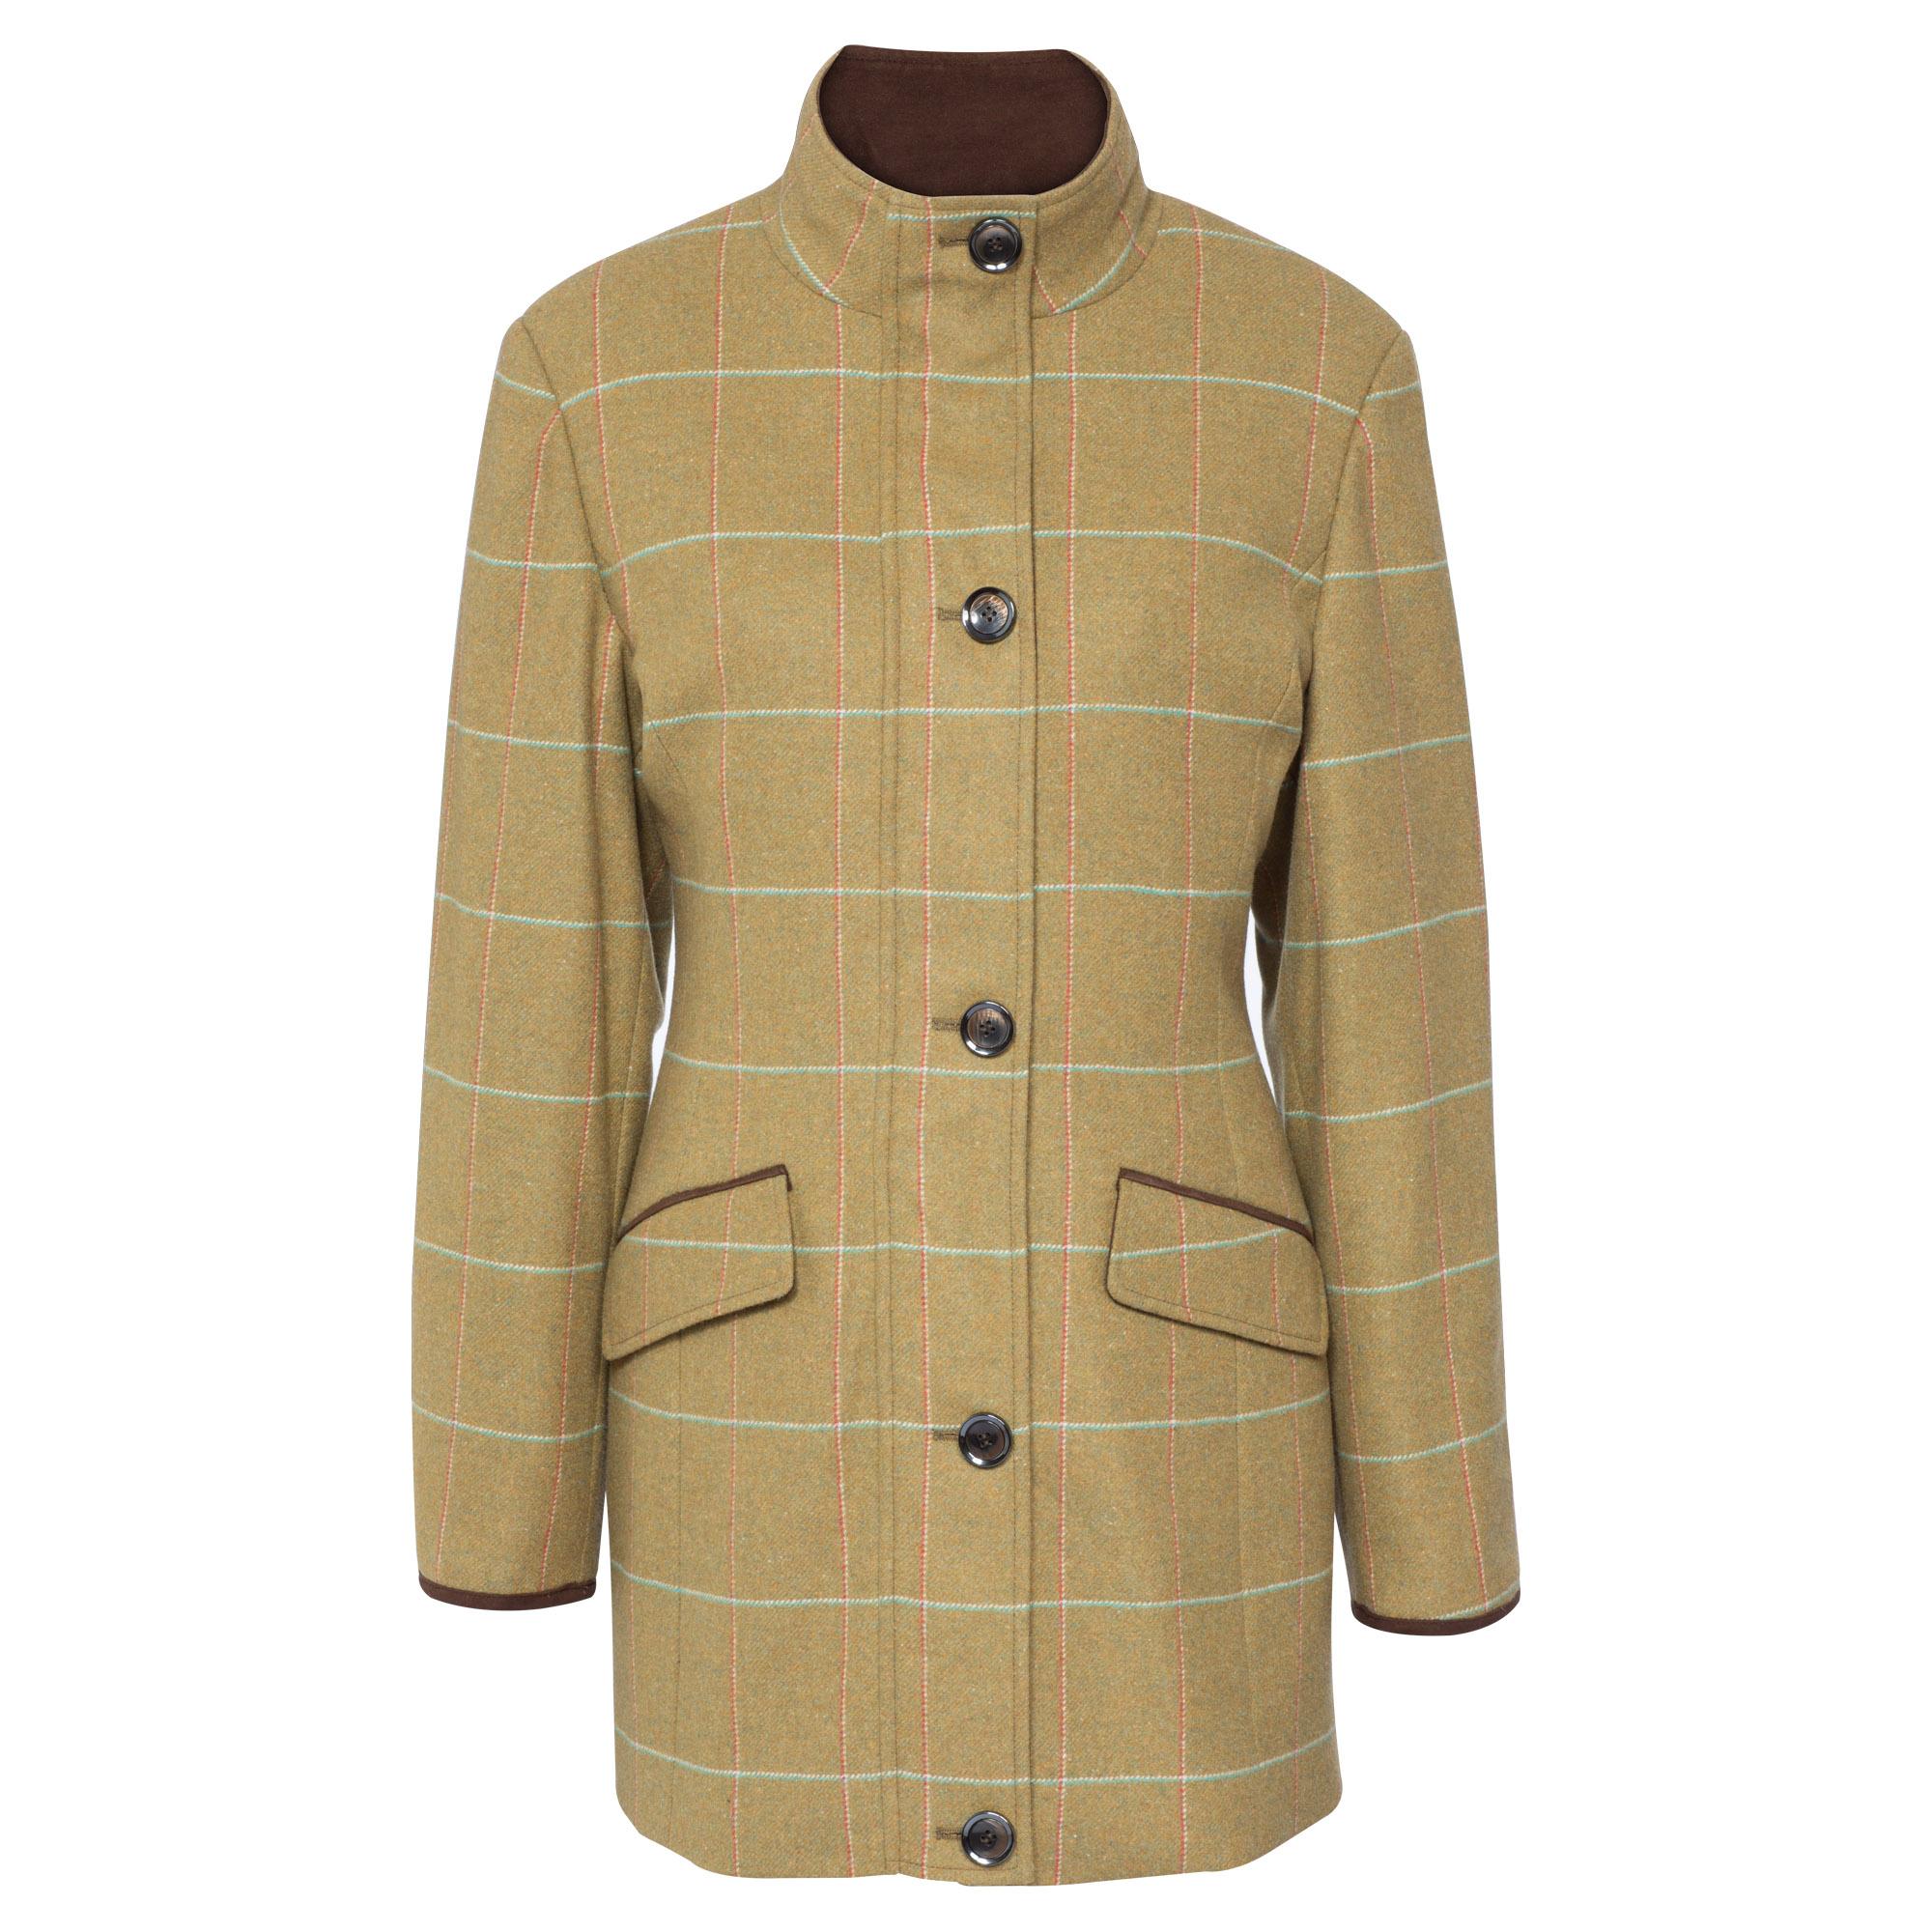 Alan Paine Combrook Ladies Field Jacket in Meadow.jpg